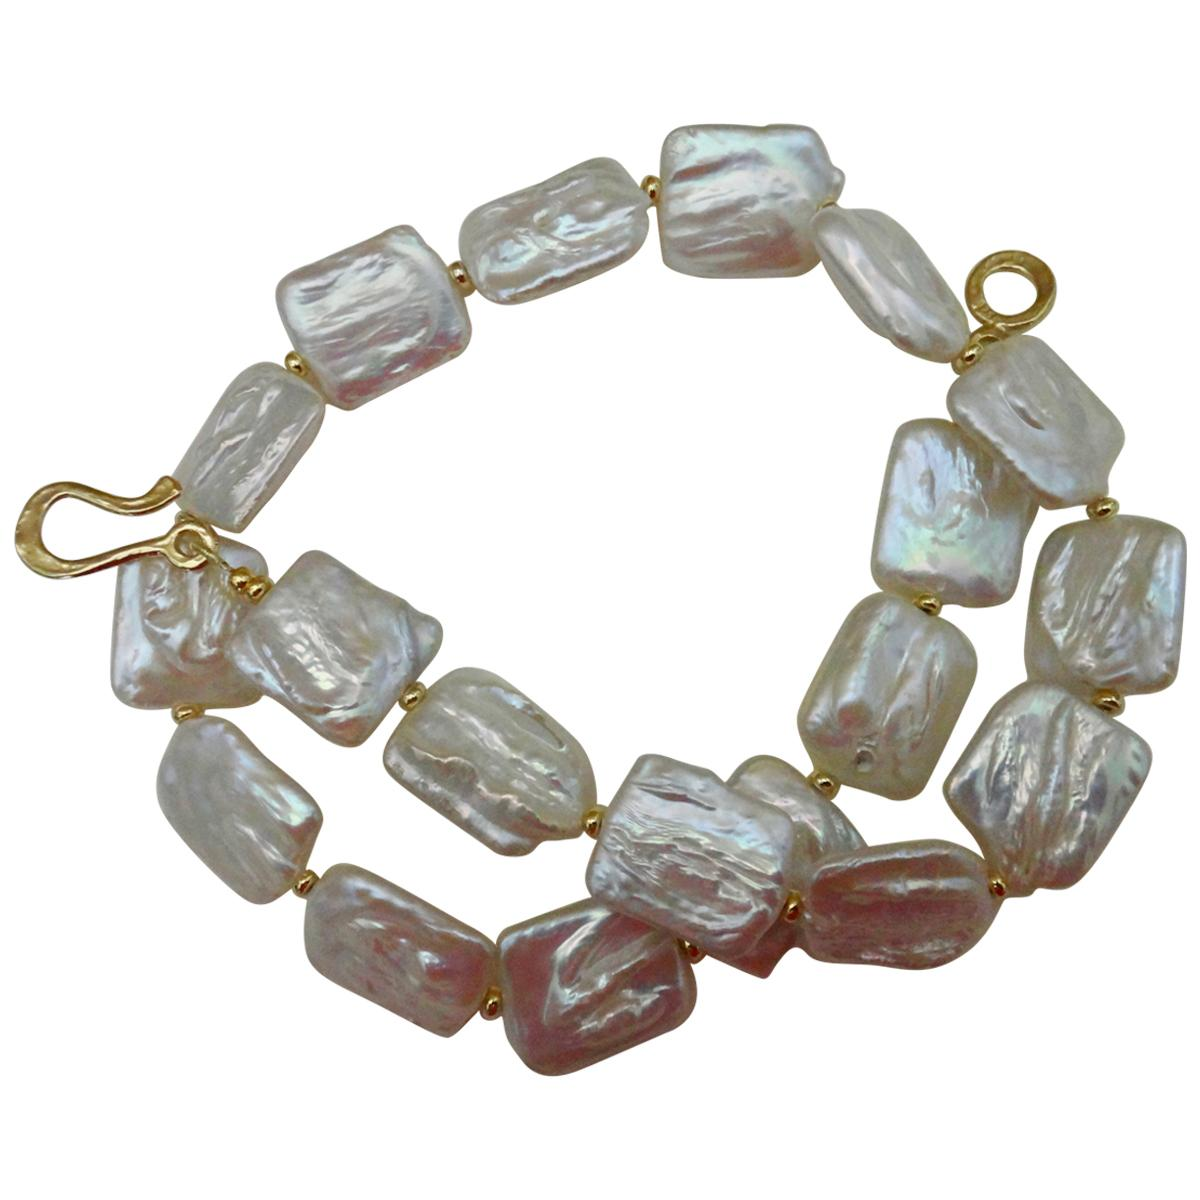 Michael Kneebone Tile Pearl Gold Bead Necklace